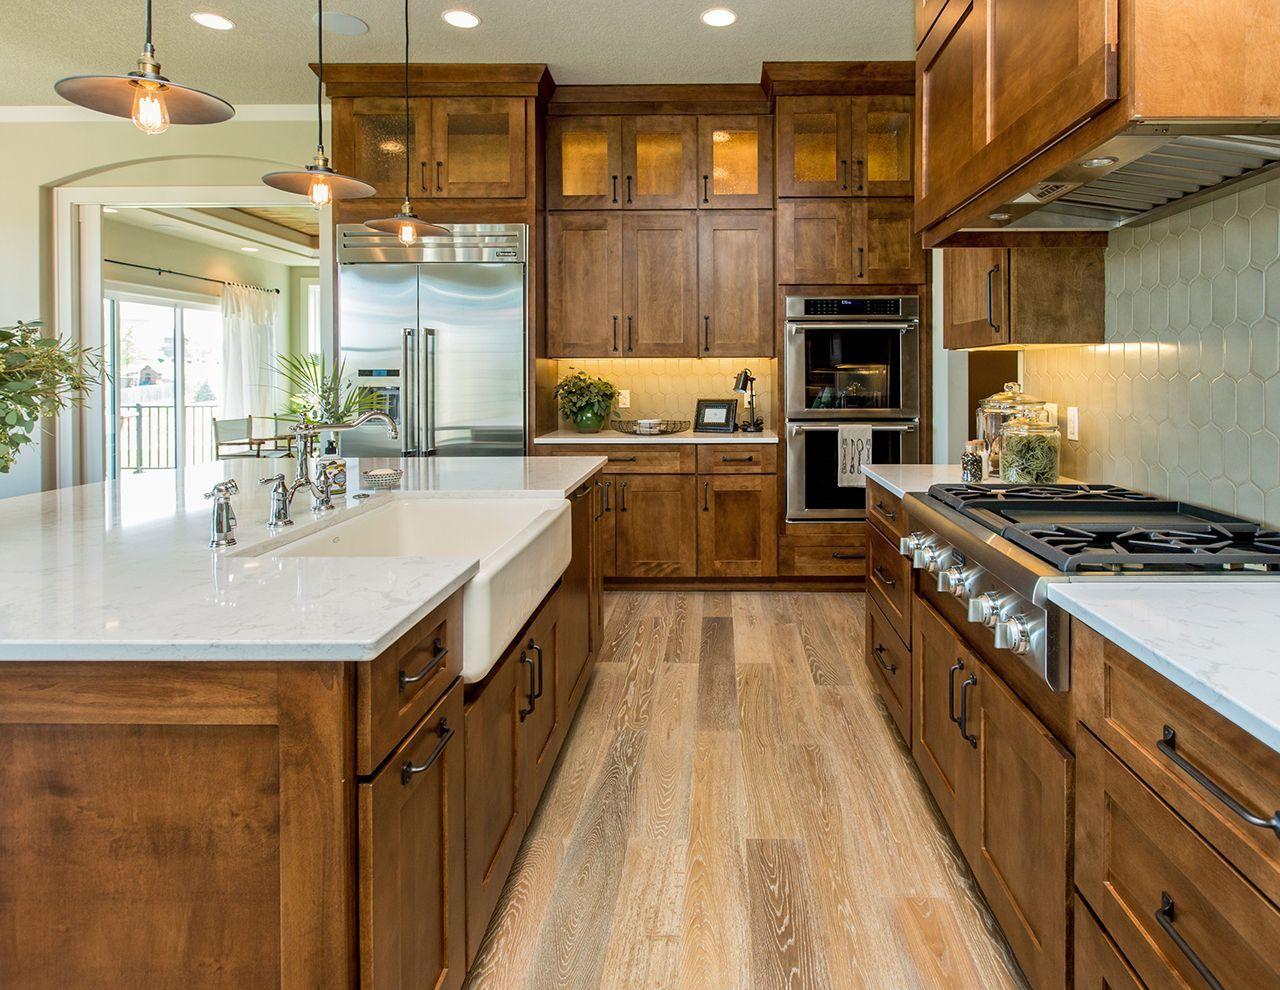 Merveilleux 55+ Quartz Countertops Des Moines   Kitchen Island Countertop Ideas Check  More At Http: